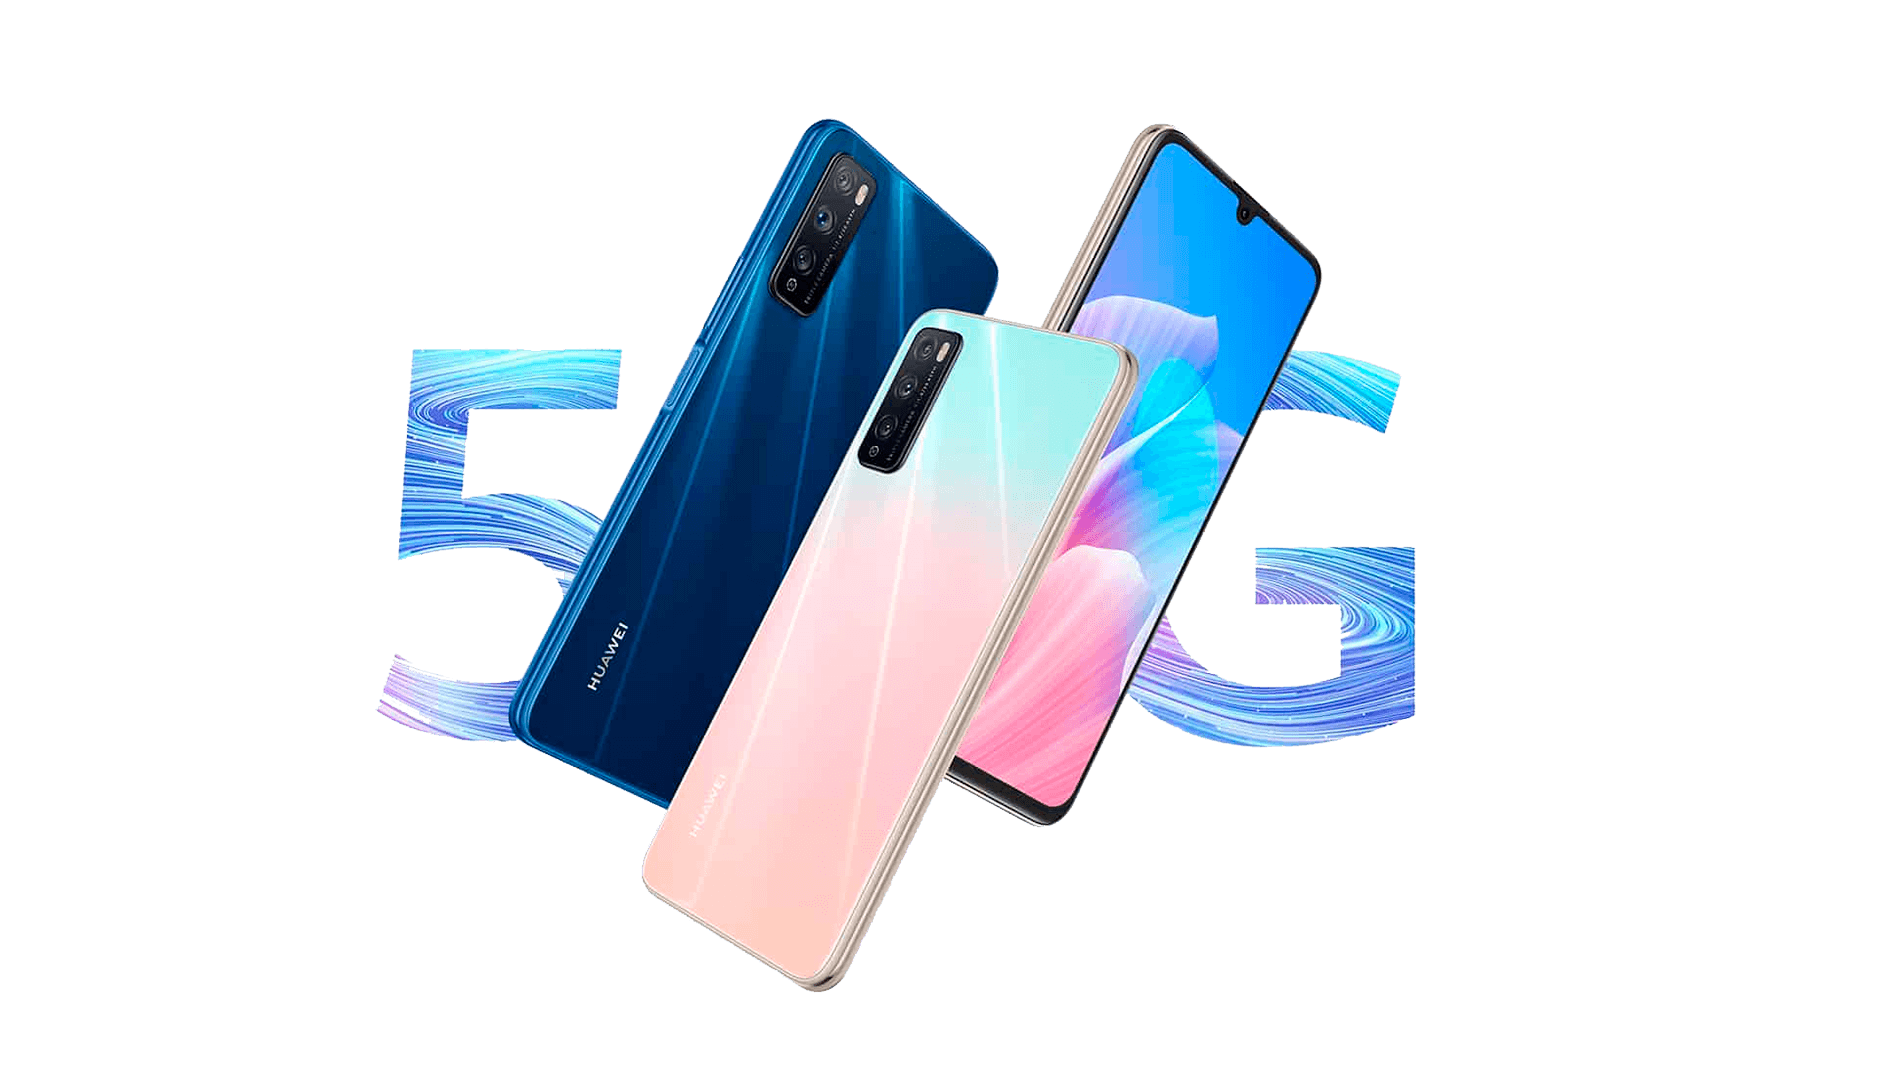 Ремонт смартфона Huawei Enjoy 20 Plus 5G